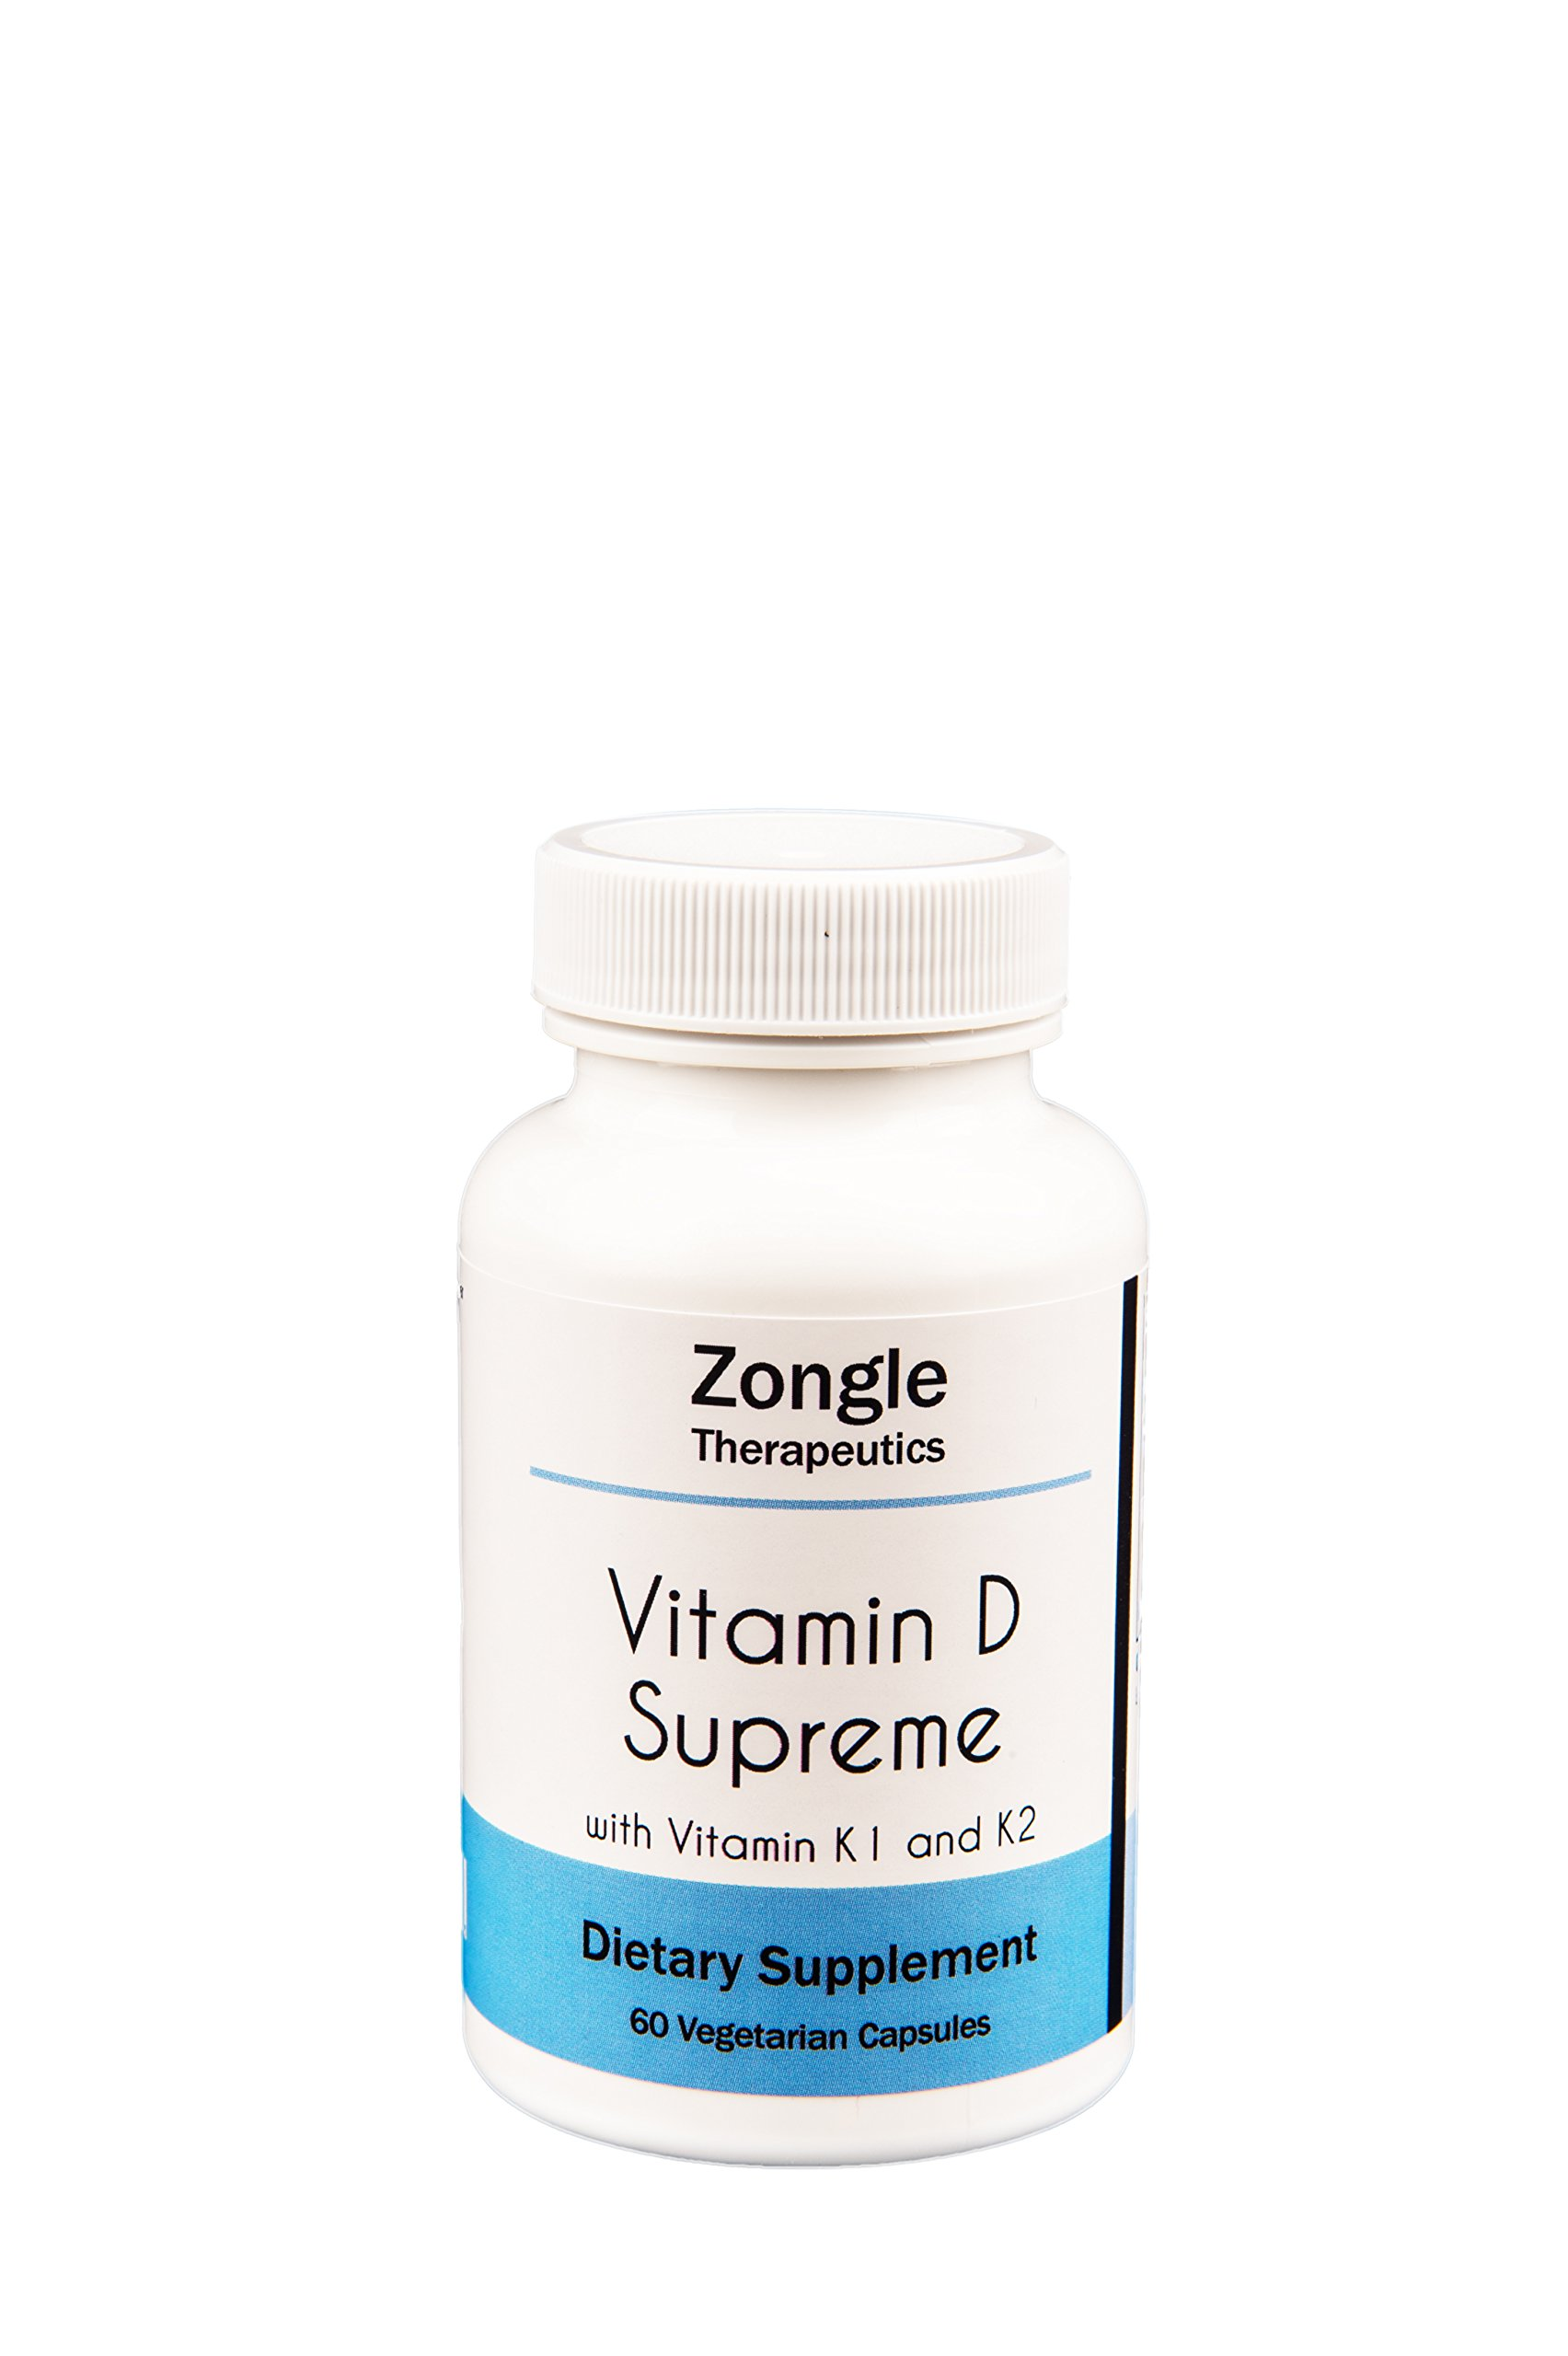 Zongle Therapeutics - Vitamin D Supreme with K1 and K2 - 60 Vegetarian Caps - D3 5000 IU - Vitamin K 550 mcg